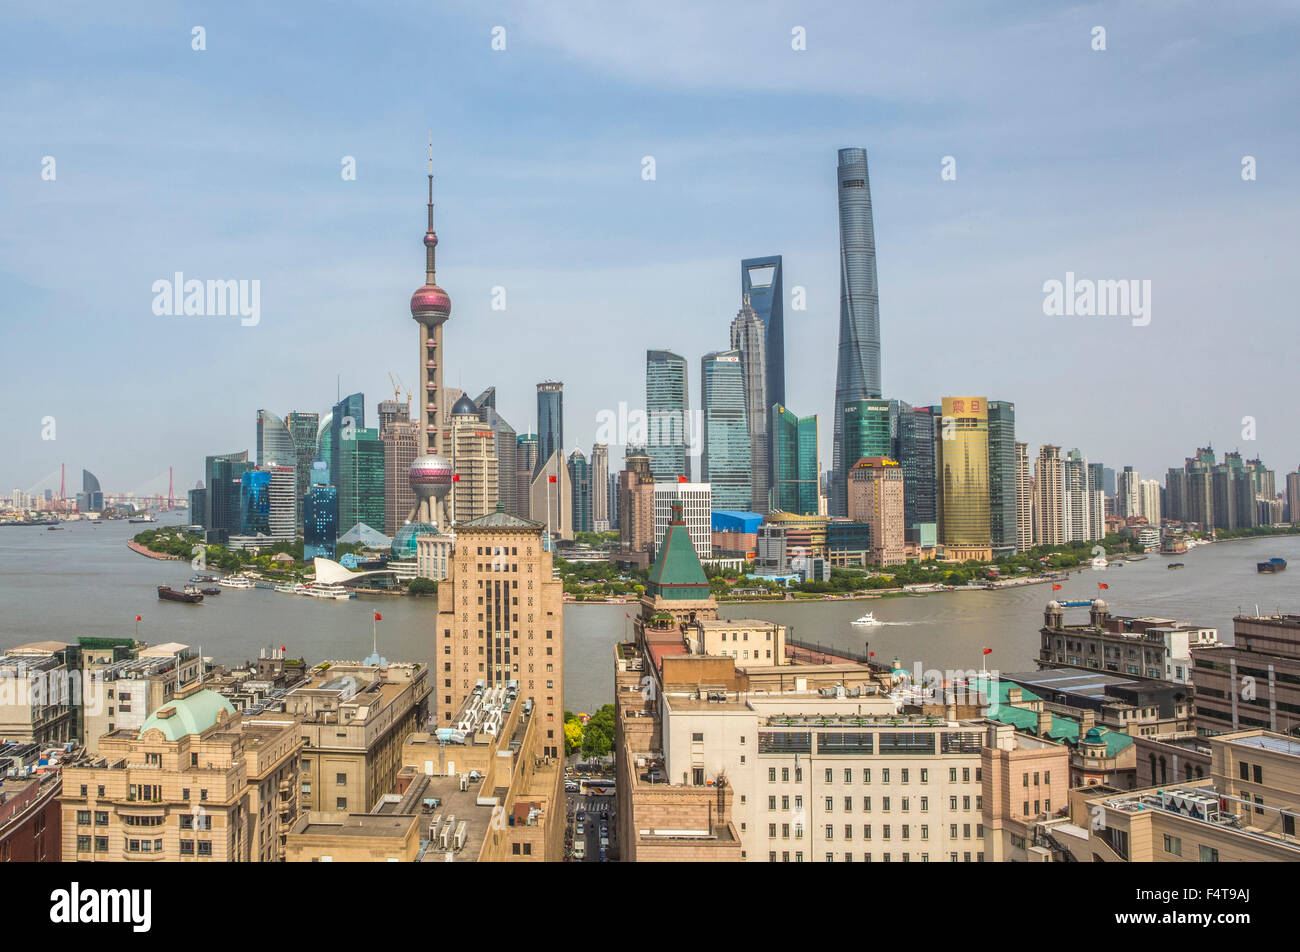 Cina Shanghai City, il Bund e il Pudong district skyline, Fiume Huangpu Immagini Stock